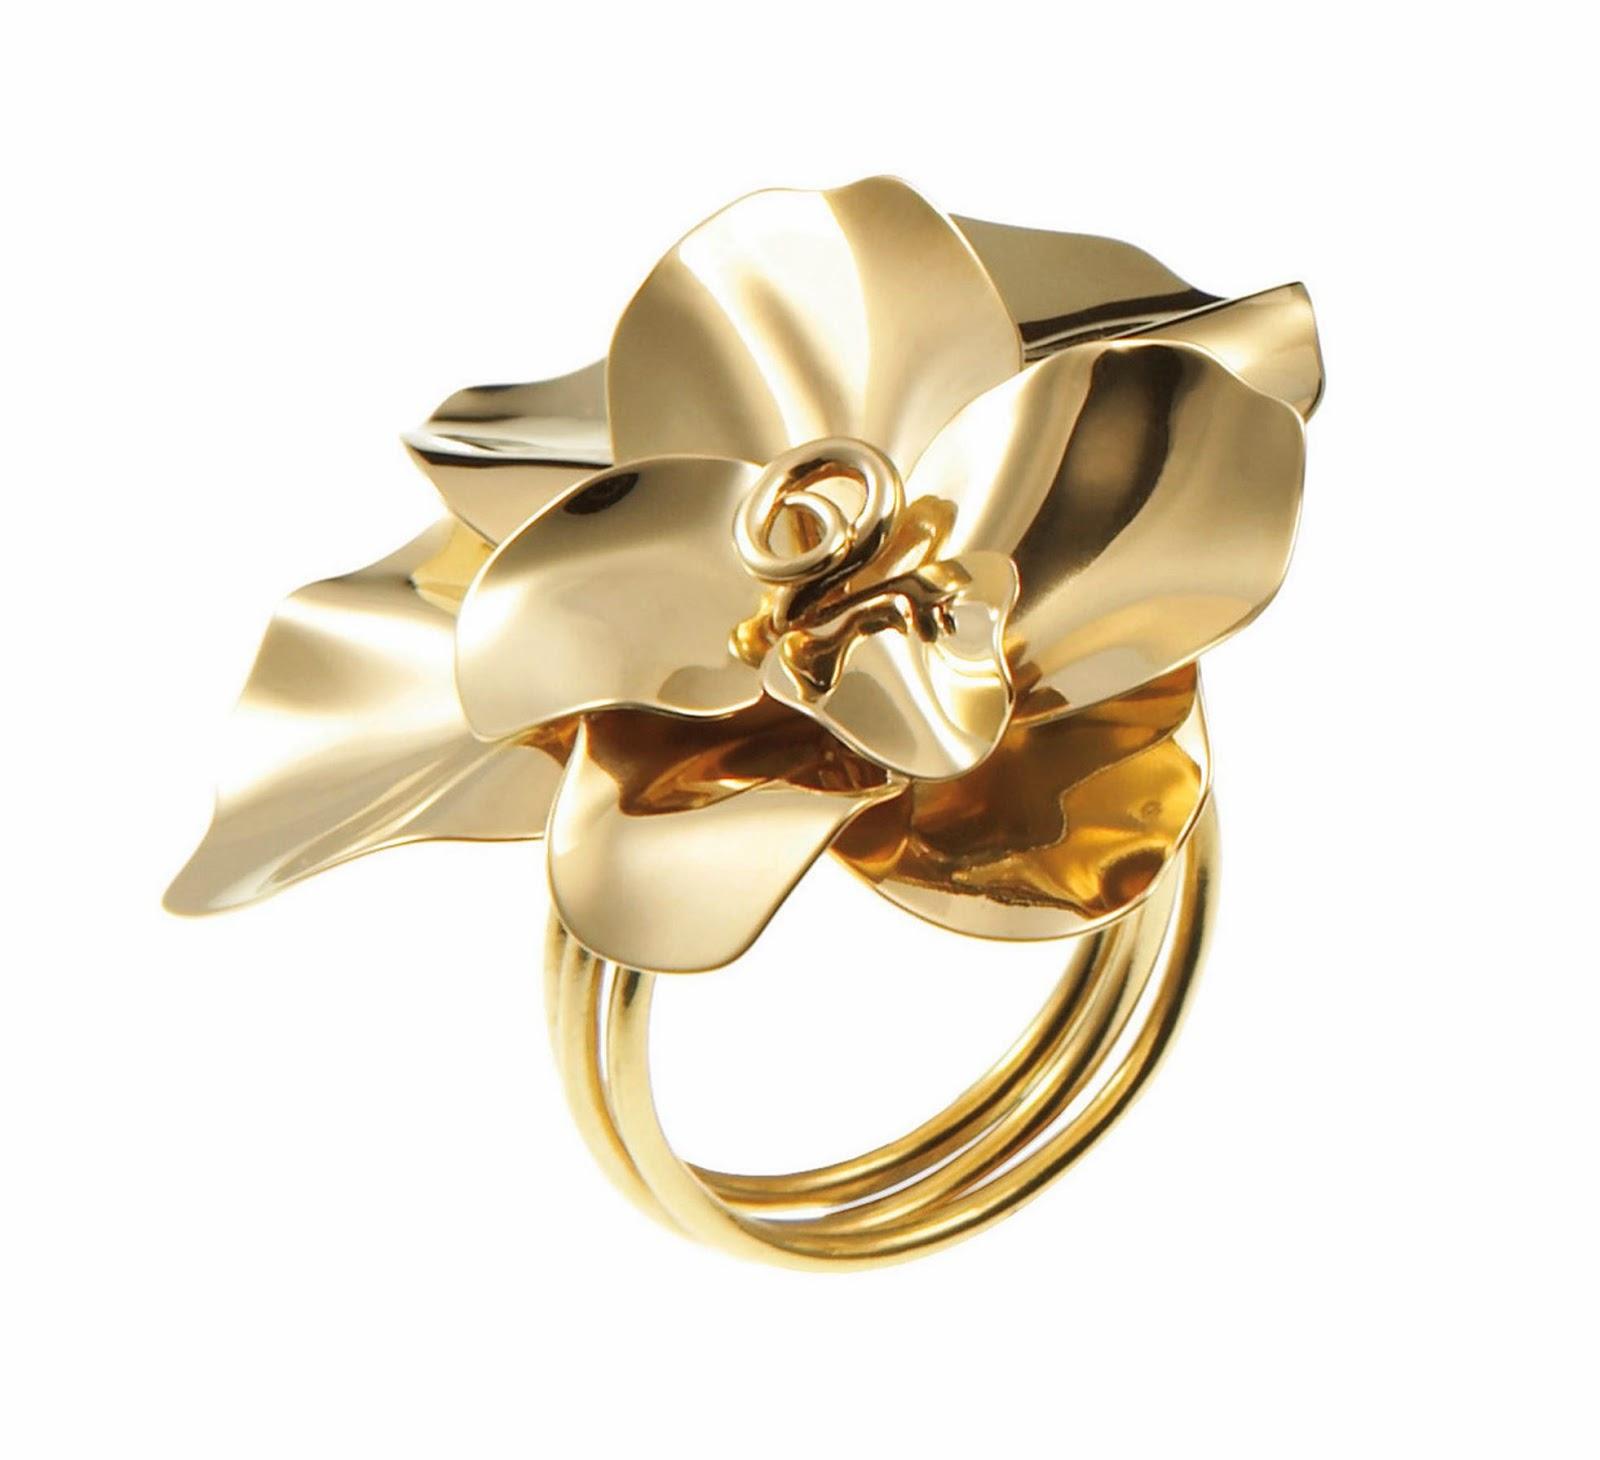 El informatorio joyas h stern dise piezas de oro for Disenos de joyas en oro